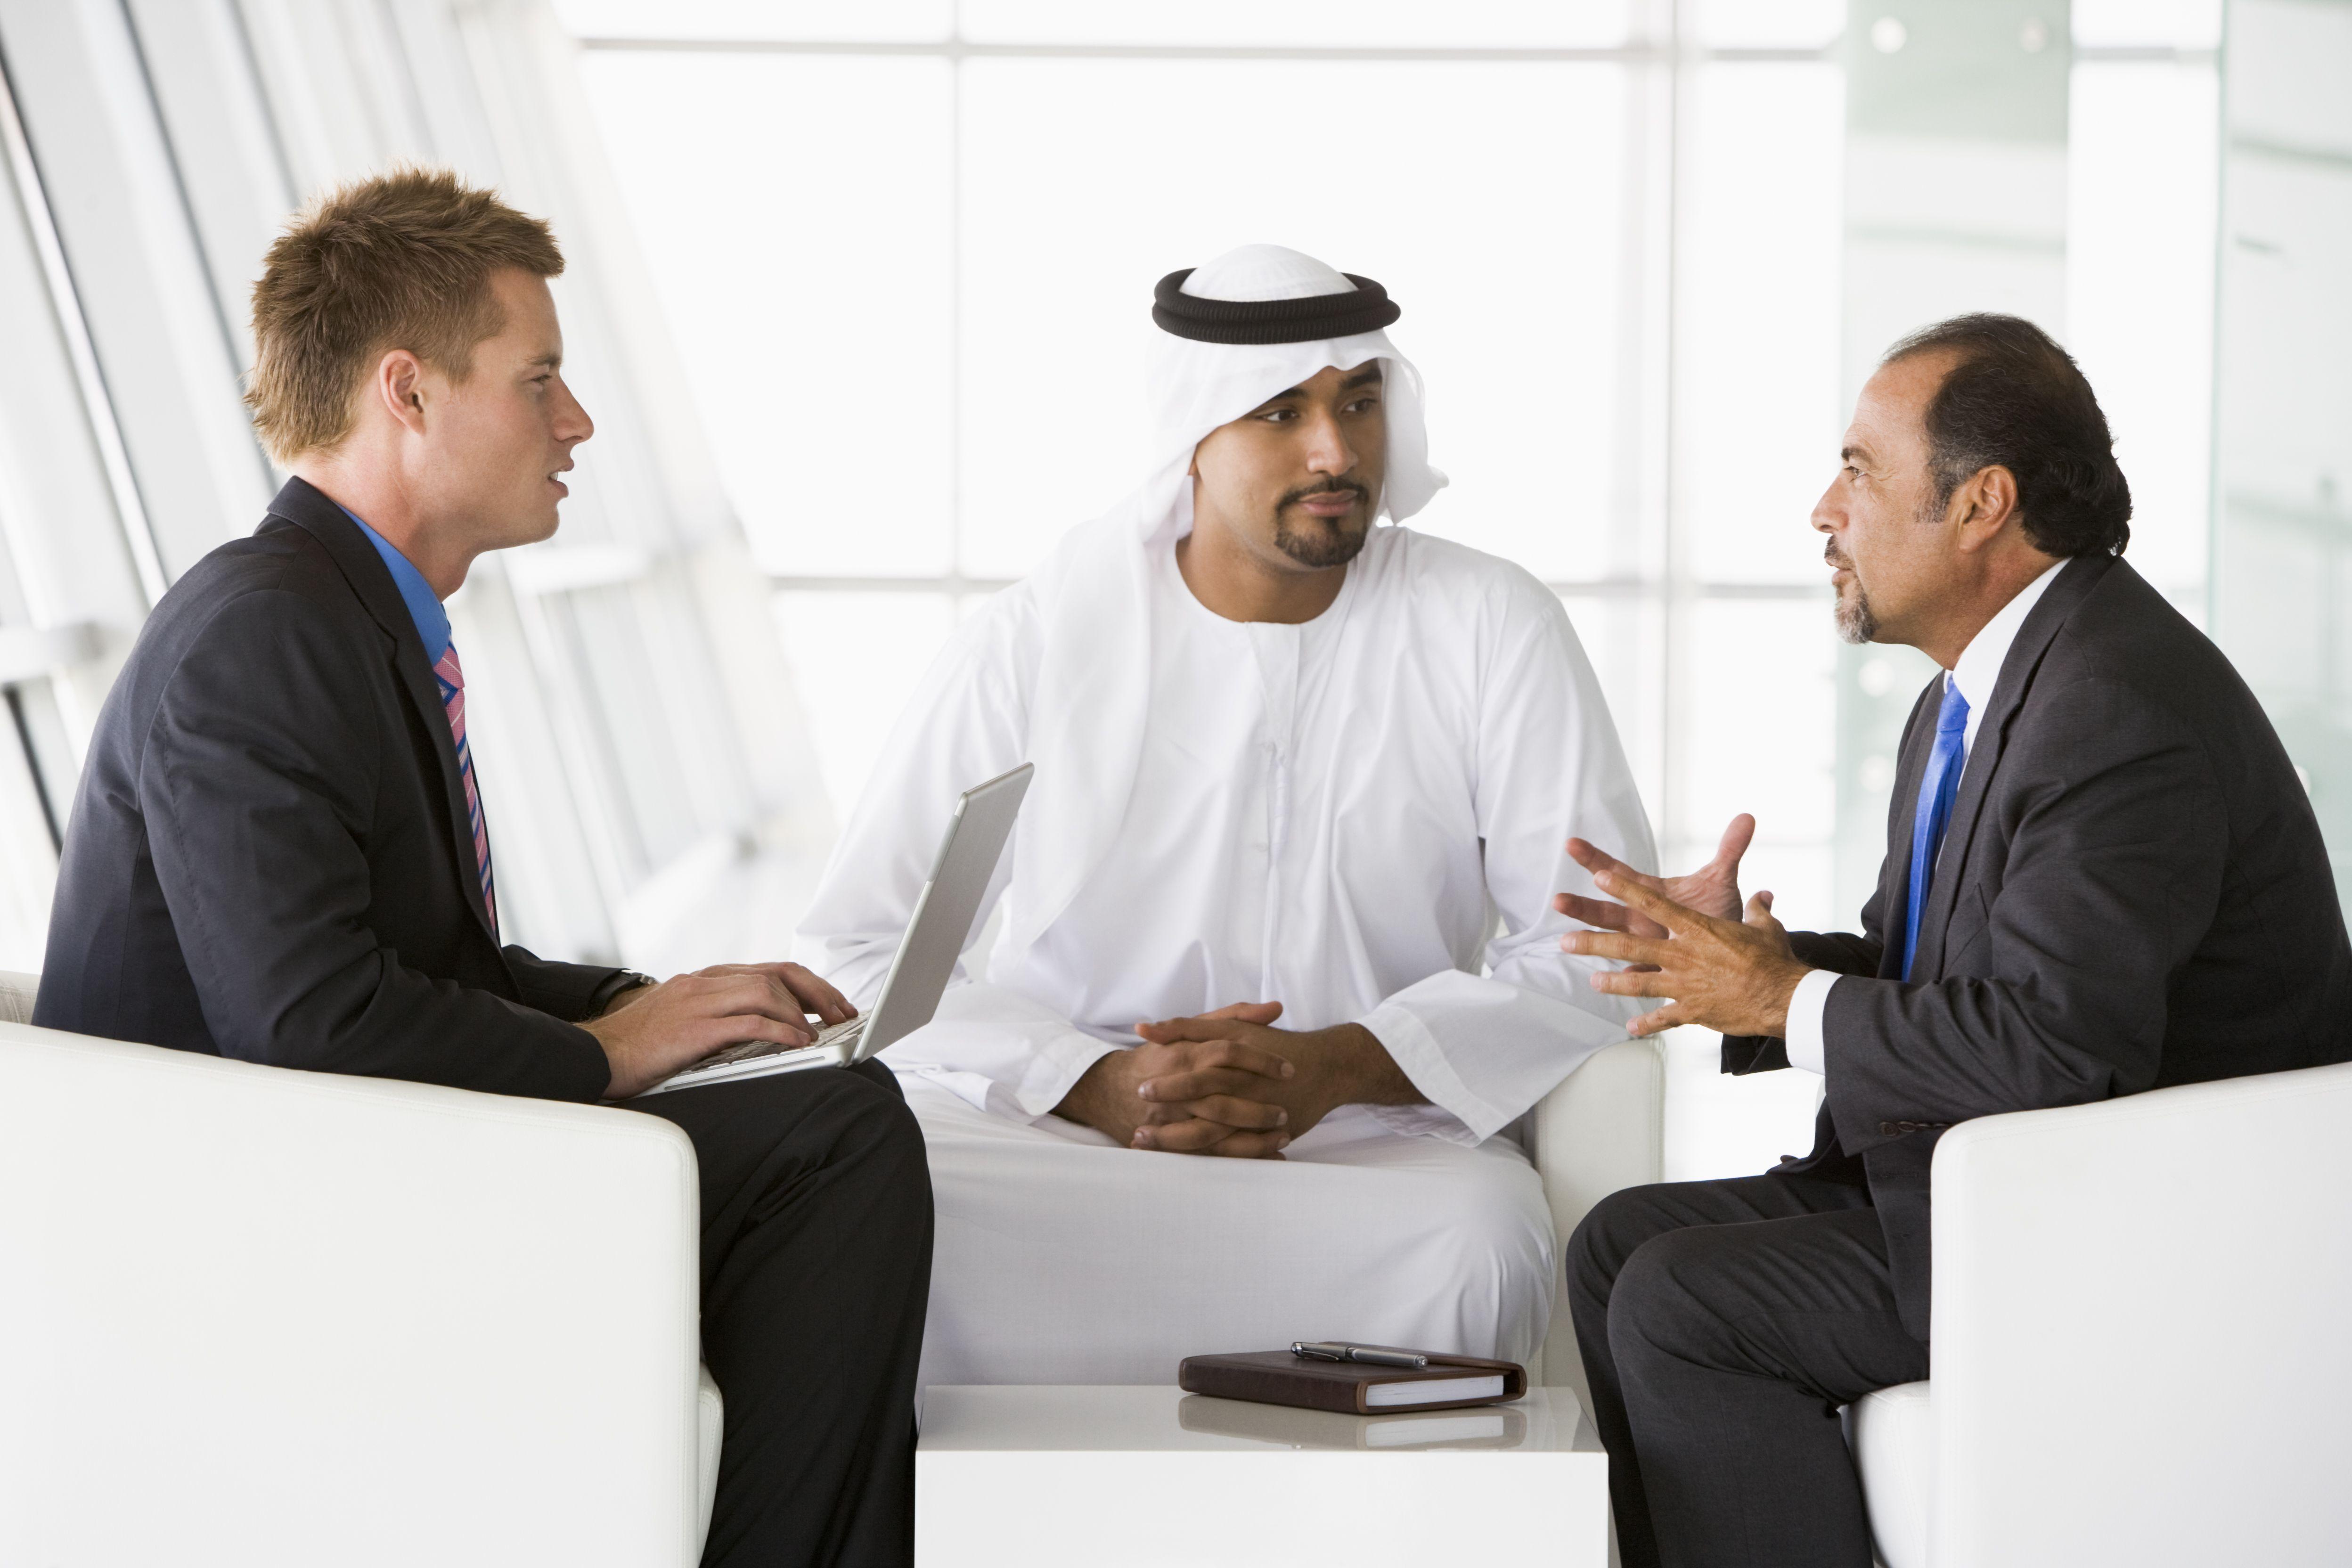 arab-business-meeting